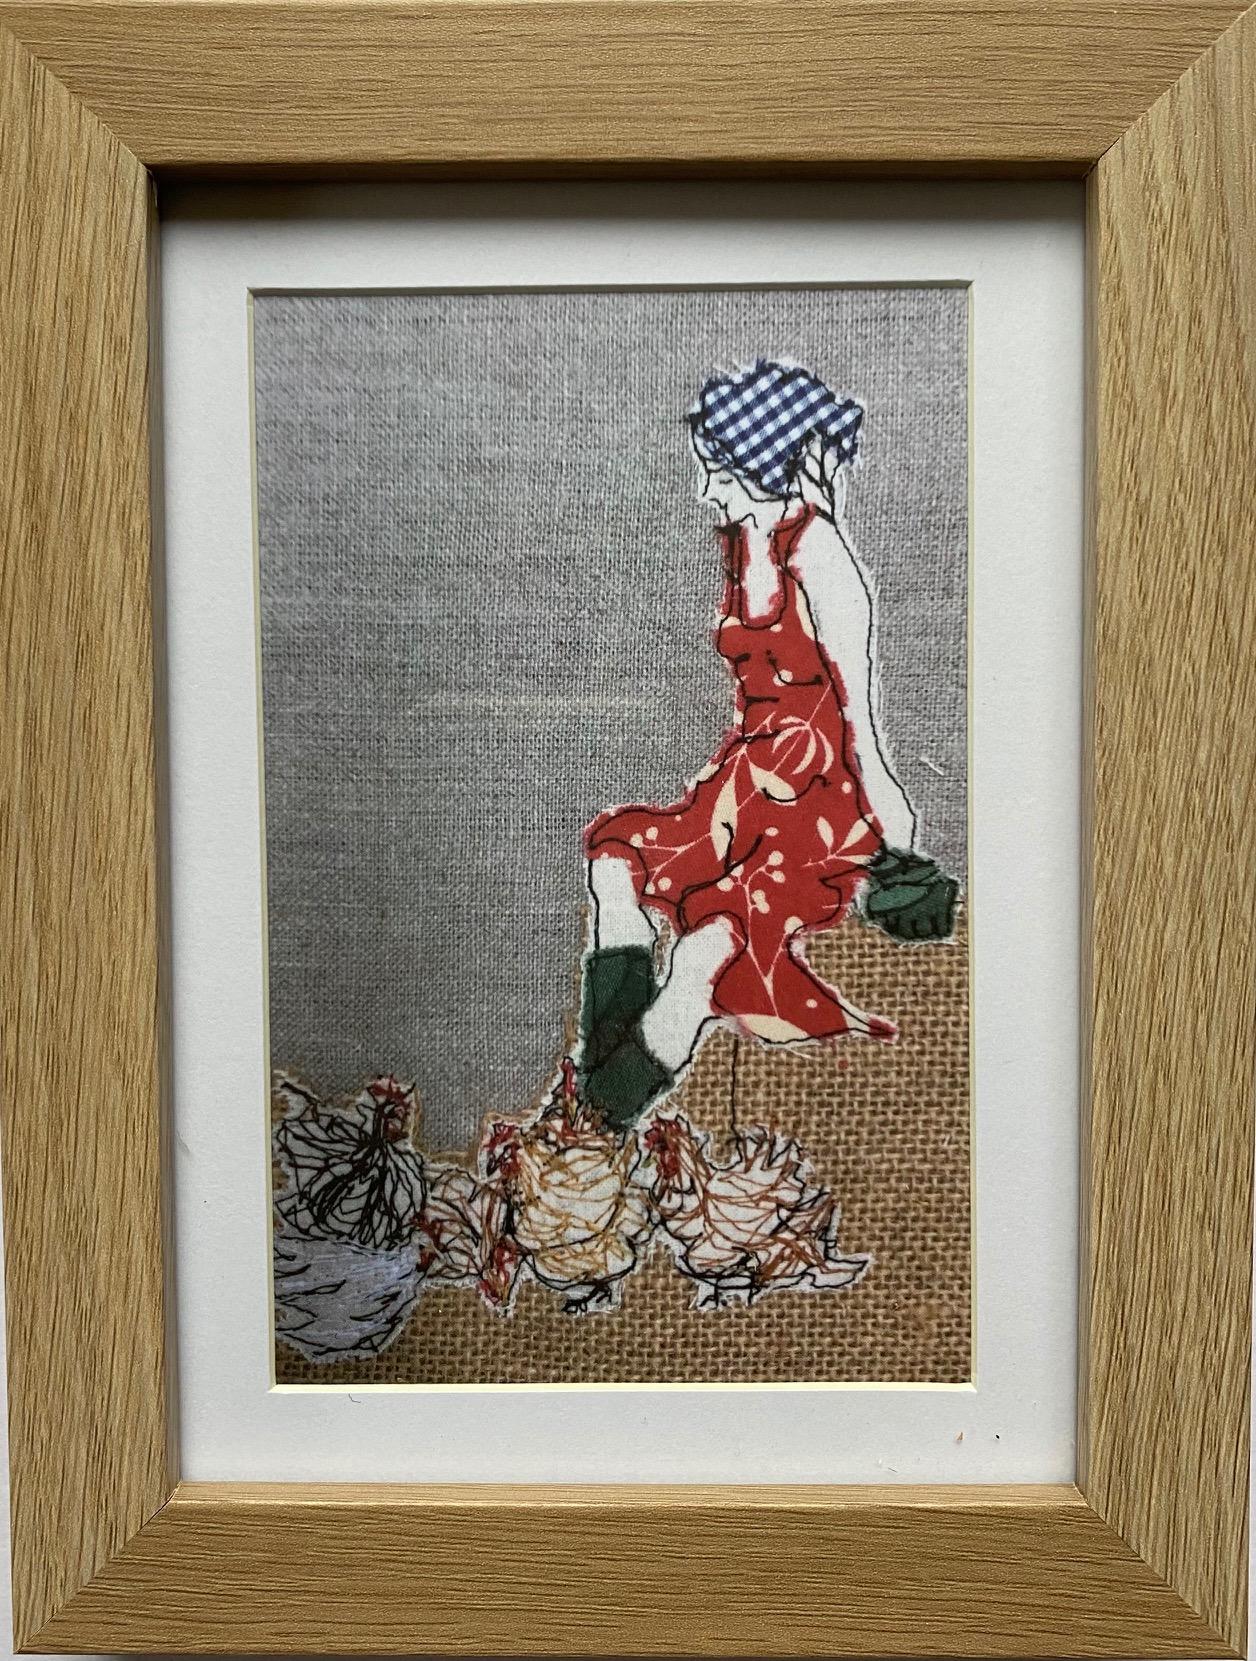 Mistress Of The Chickens Artwork Print By Juliet D Collins (Prahran)